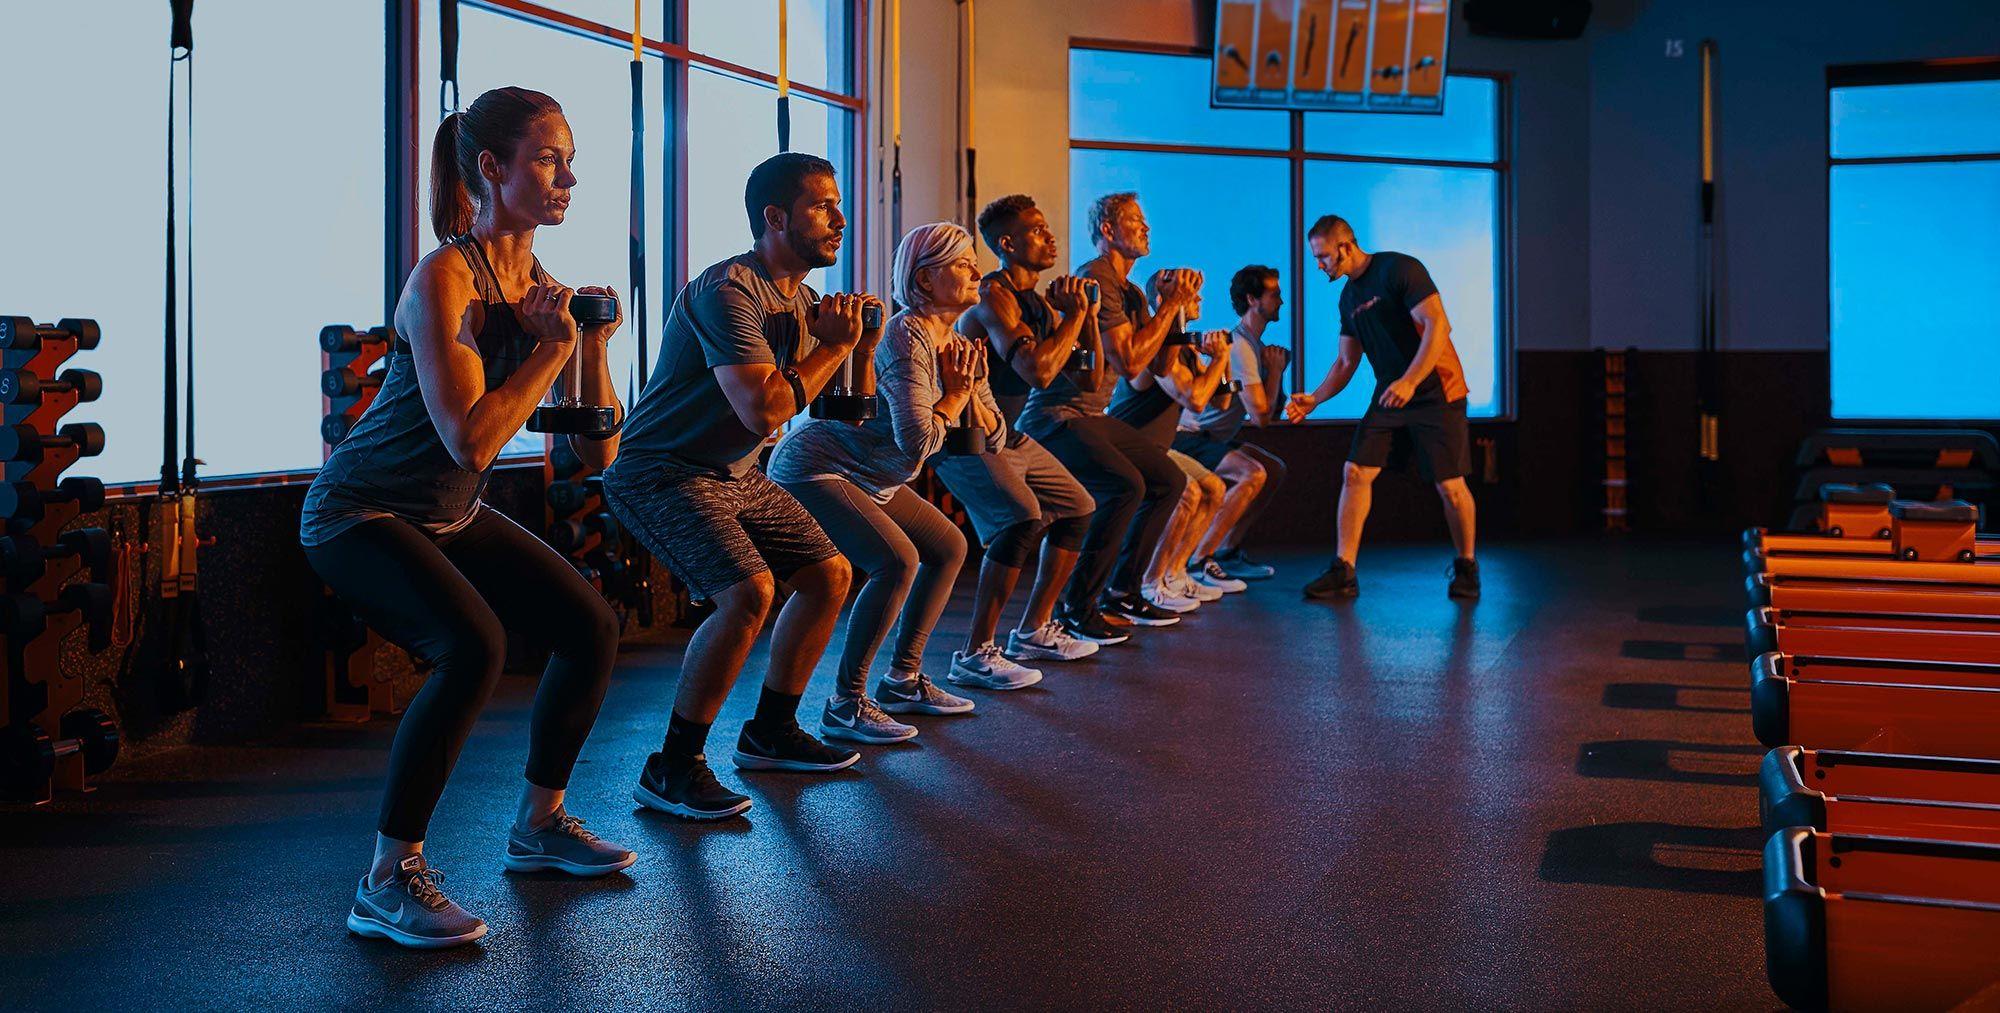 Orangetheory Fitness Gym Near Me Try A Free One Hour Workout Orange Theory Workout Hour Workout Gyms Near Me